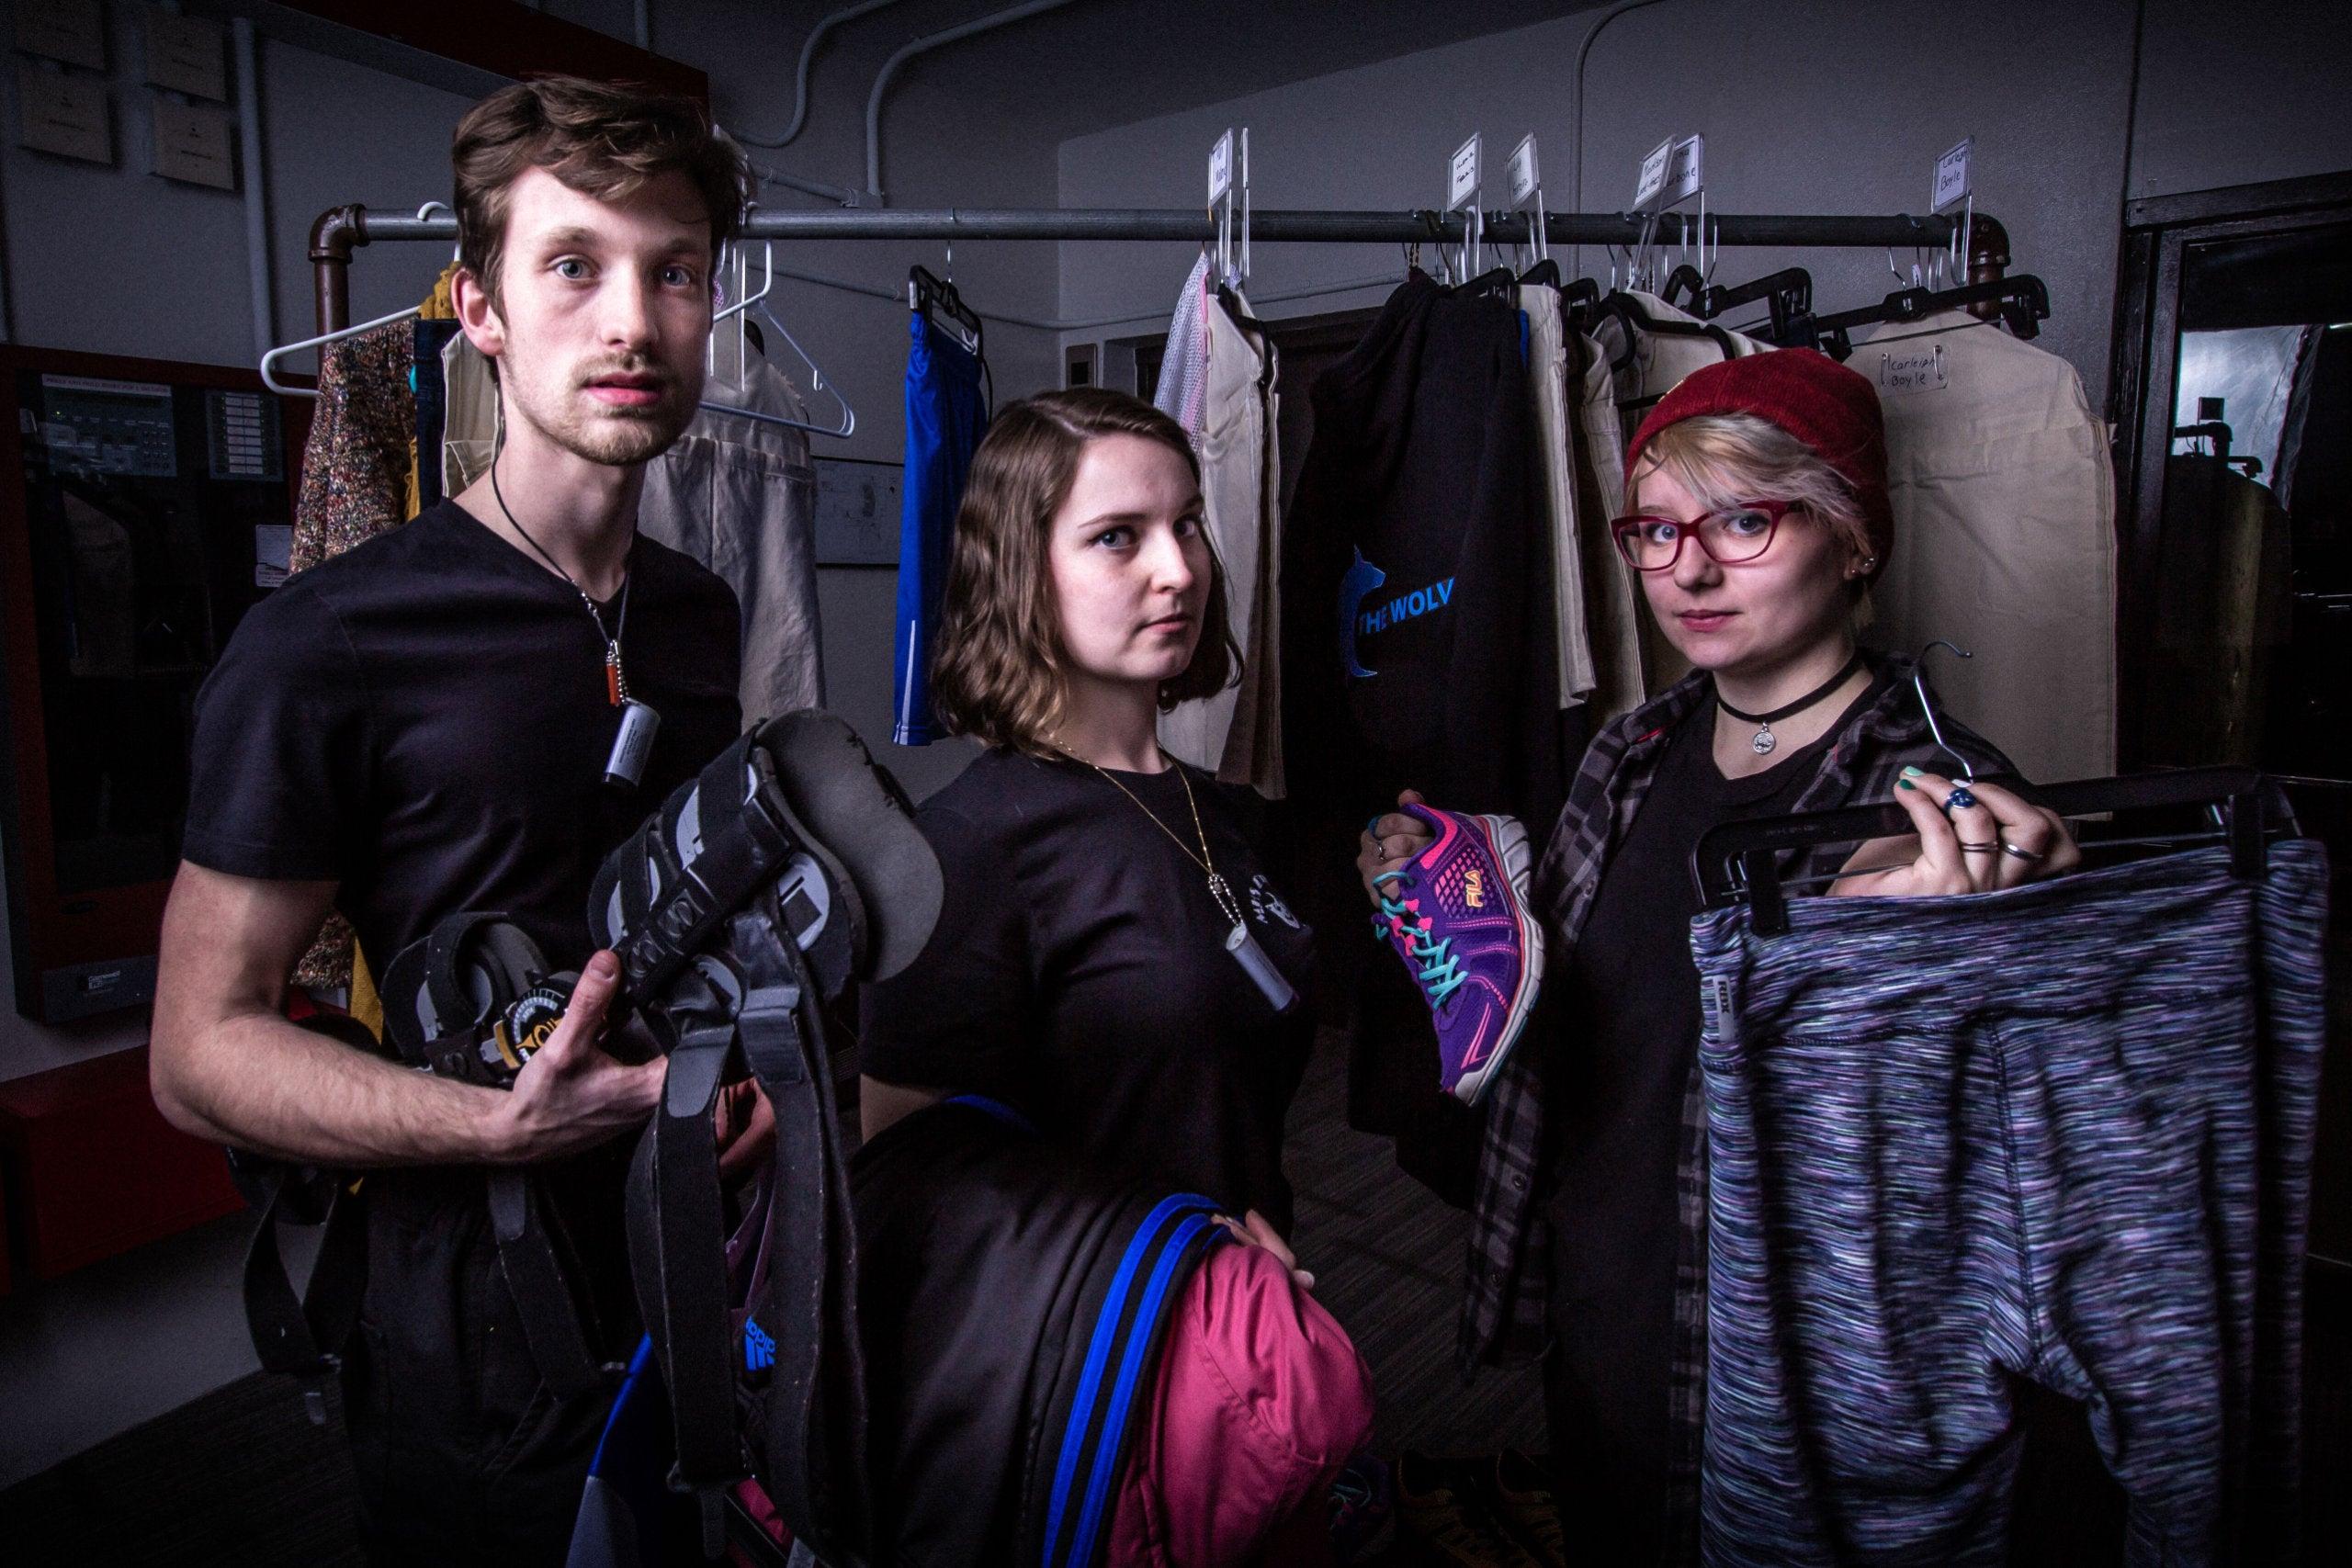 Matthew Oxley, Fiona Chlebeckek, and Athena Nakrosis